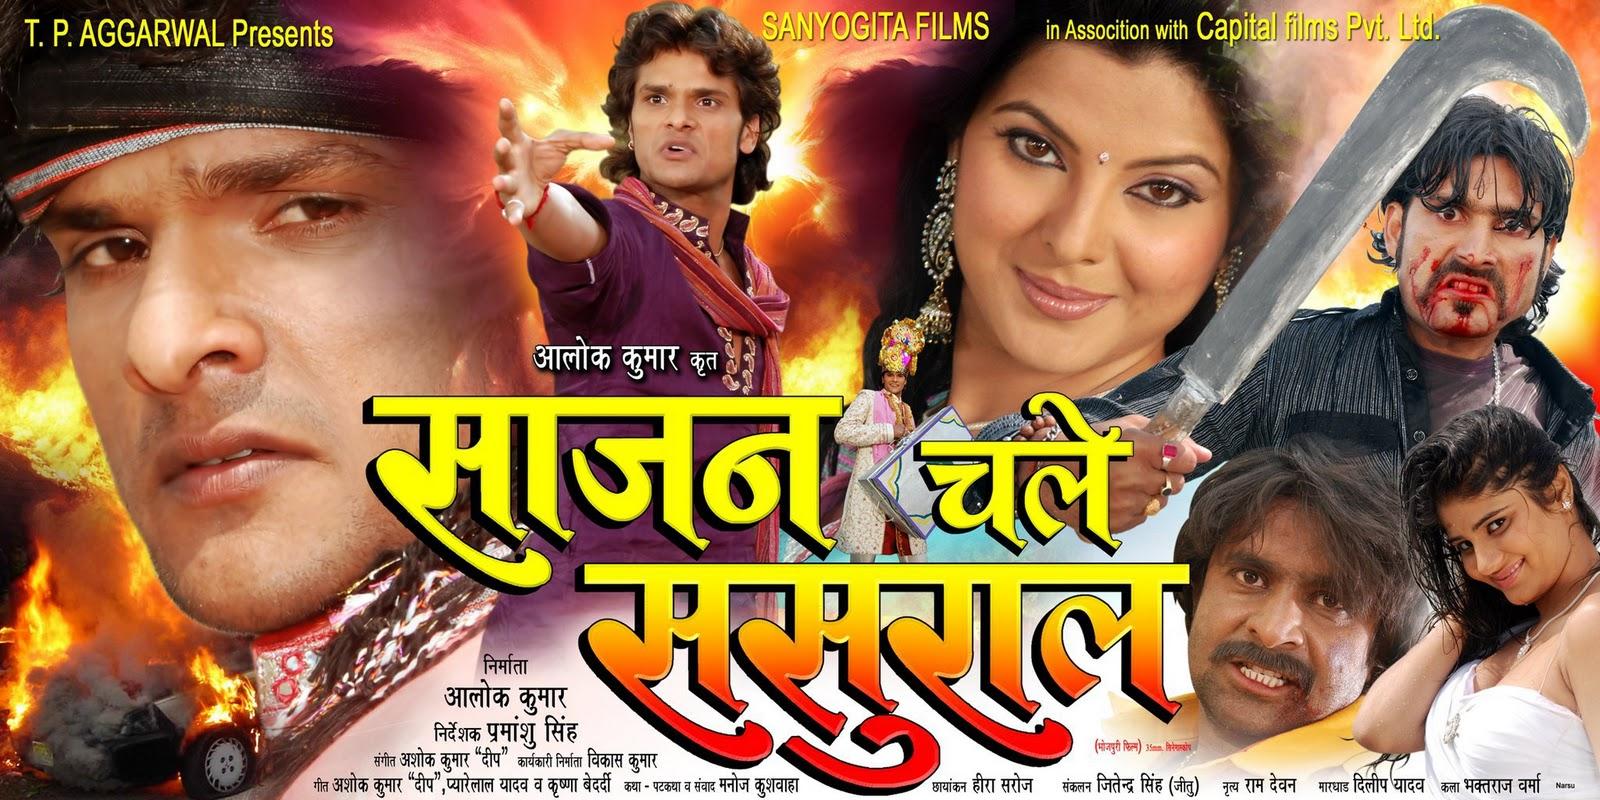 Bhojpuri songs pk bhojpuri movie album songs downloads bhojpuri